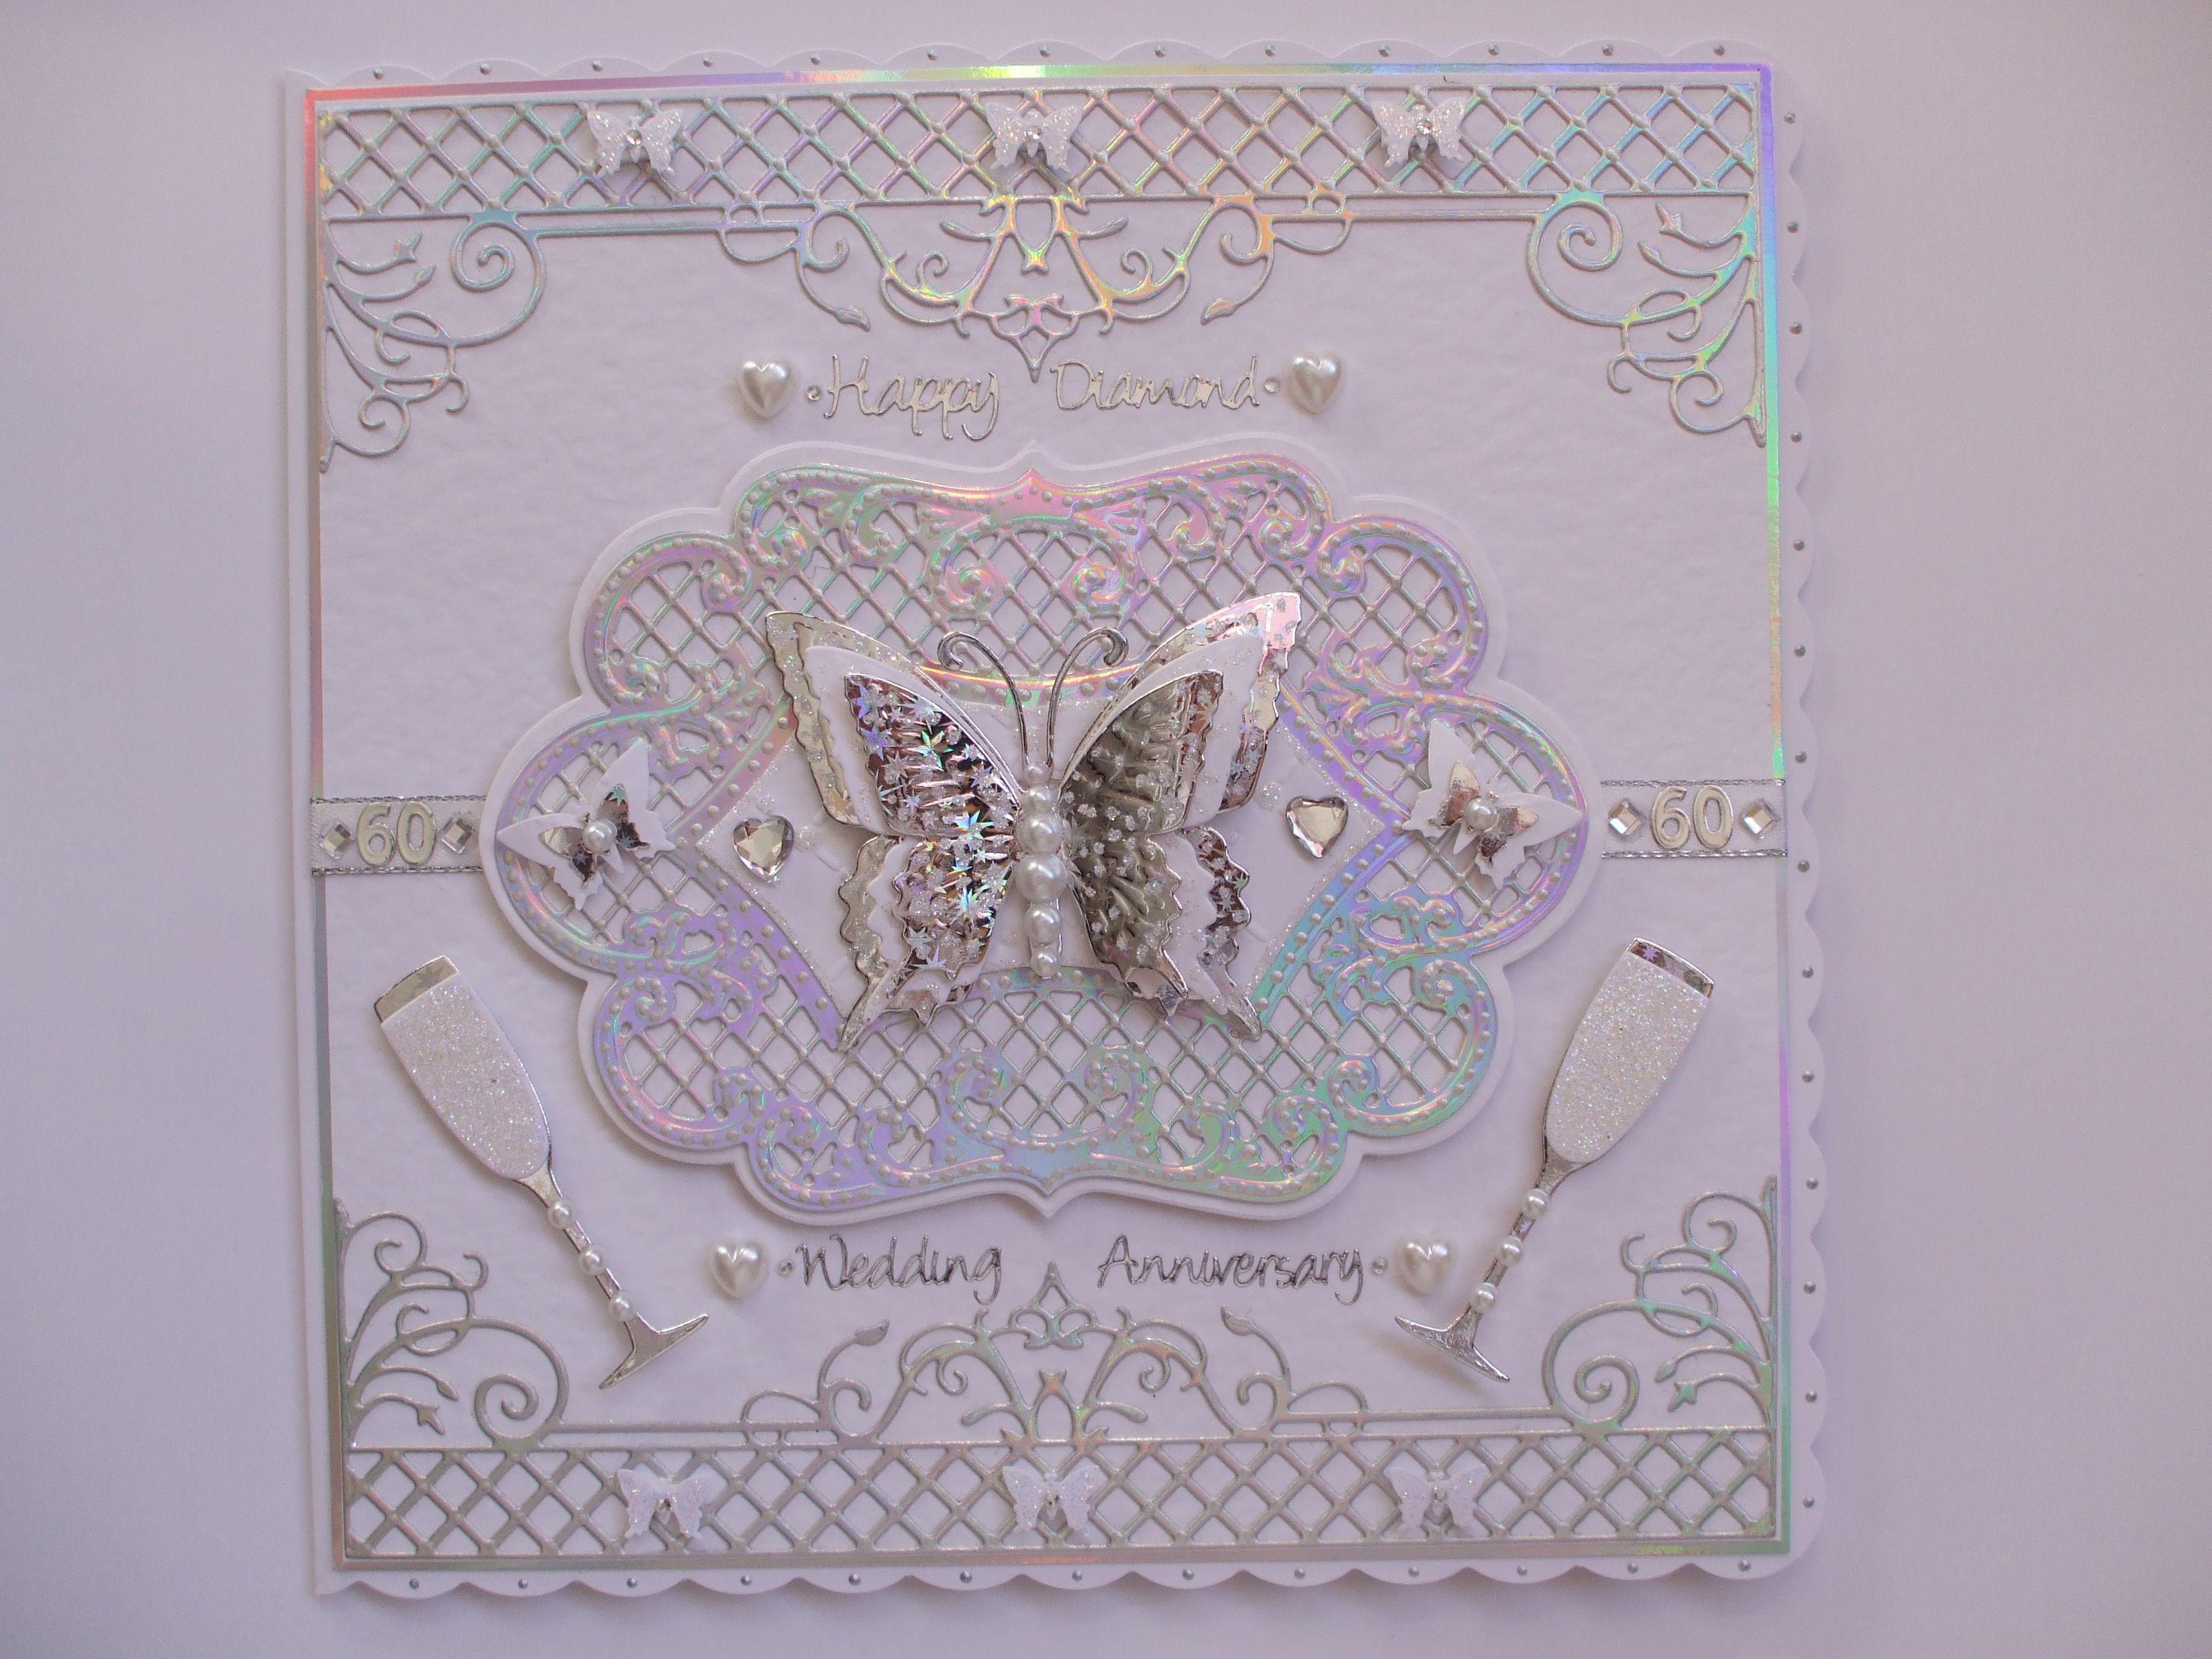 Handmade diamond wedding anniversary card cardpapercraftheartart